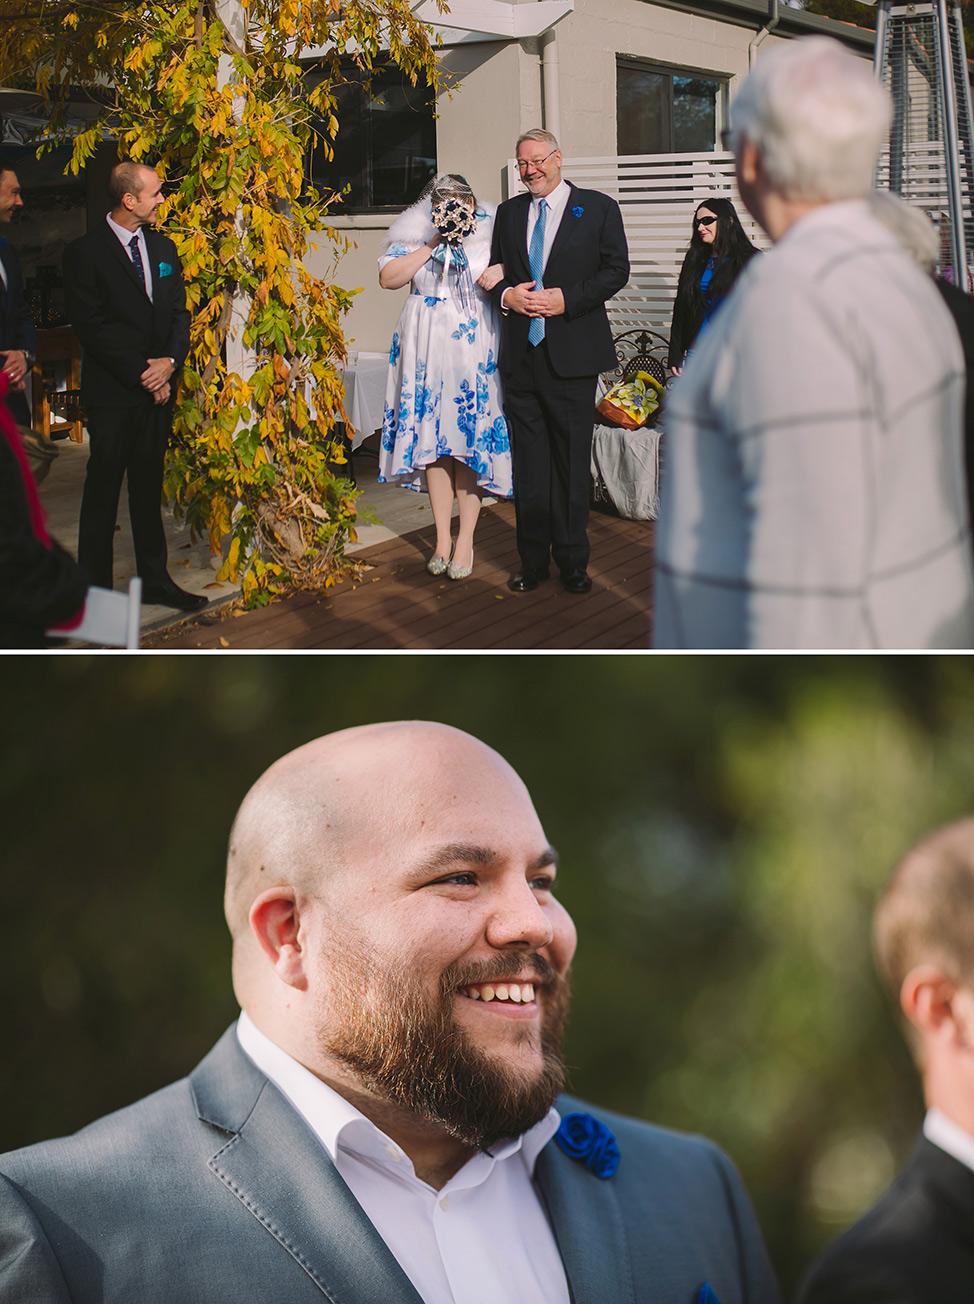 ACT Wedding Photographer Unposed Documentary Relaxed